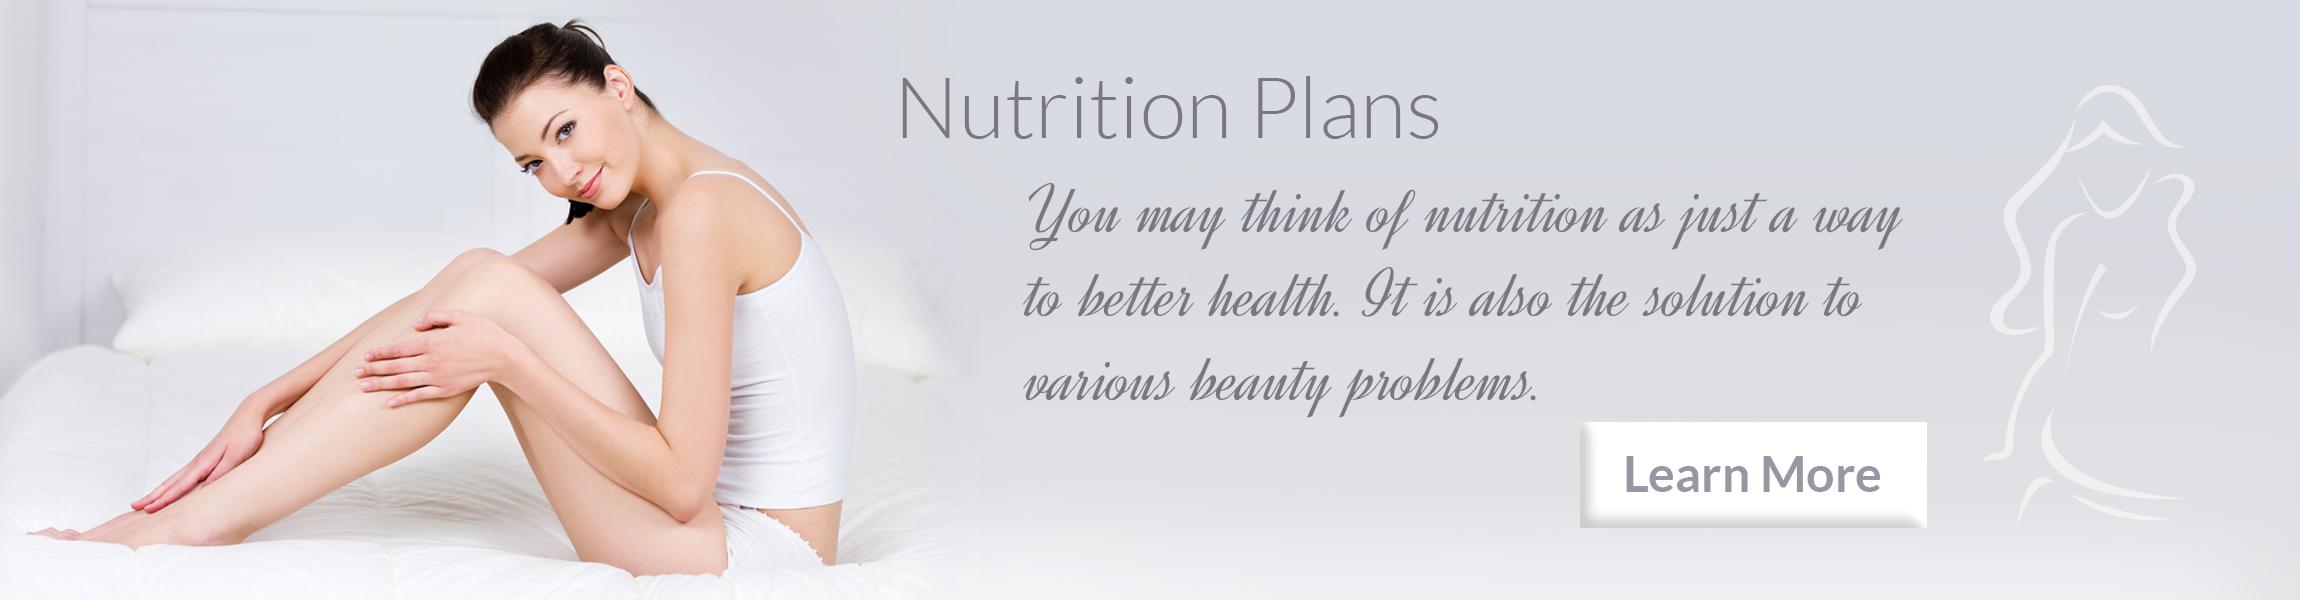 Madsen-Slides-Nutrition